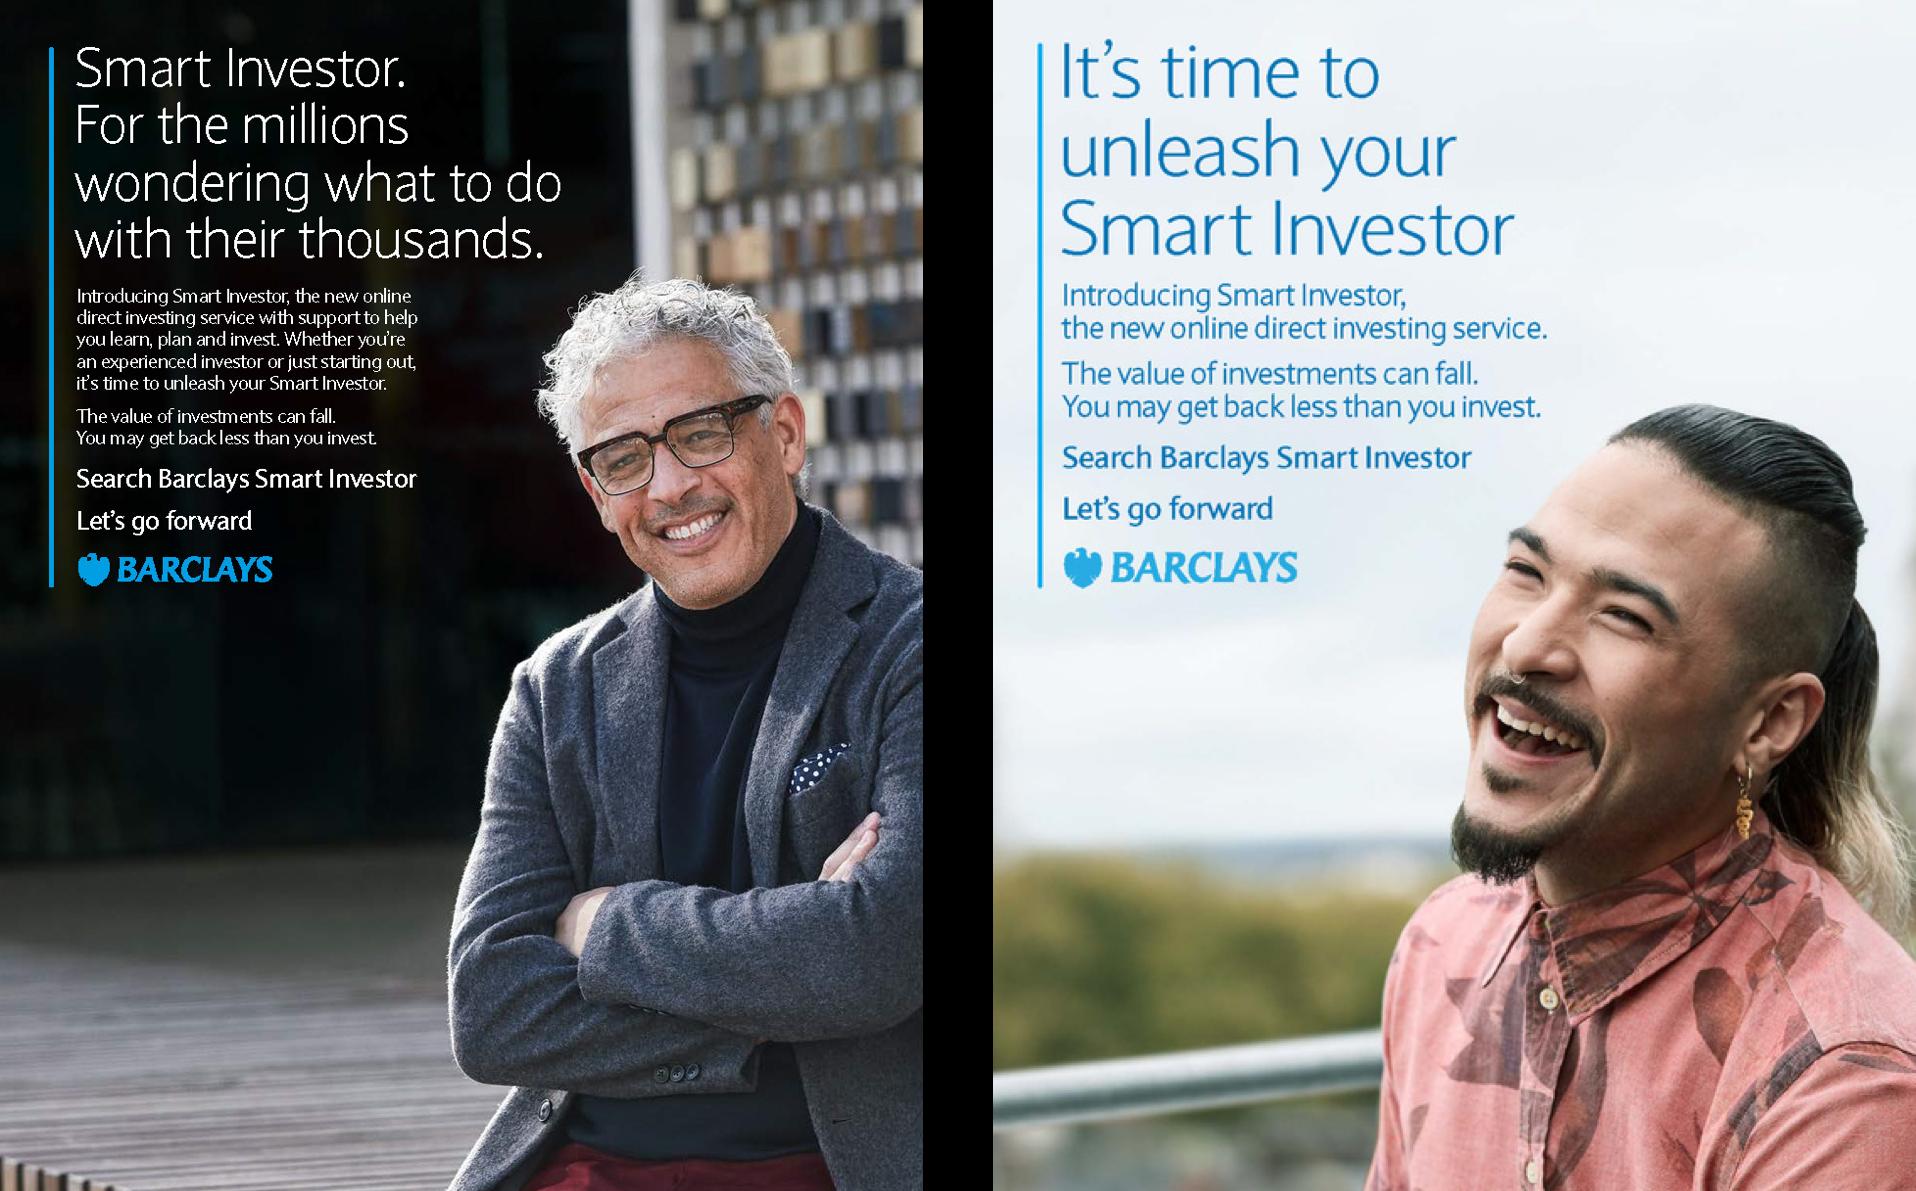 Barclays-02-3